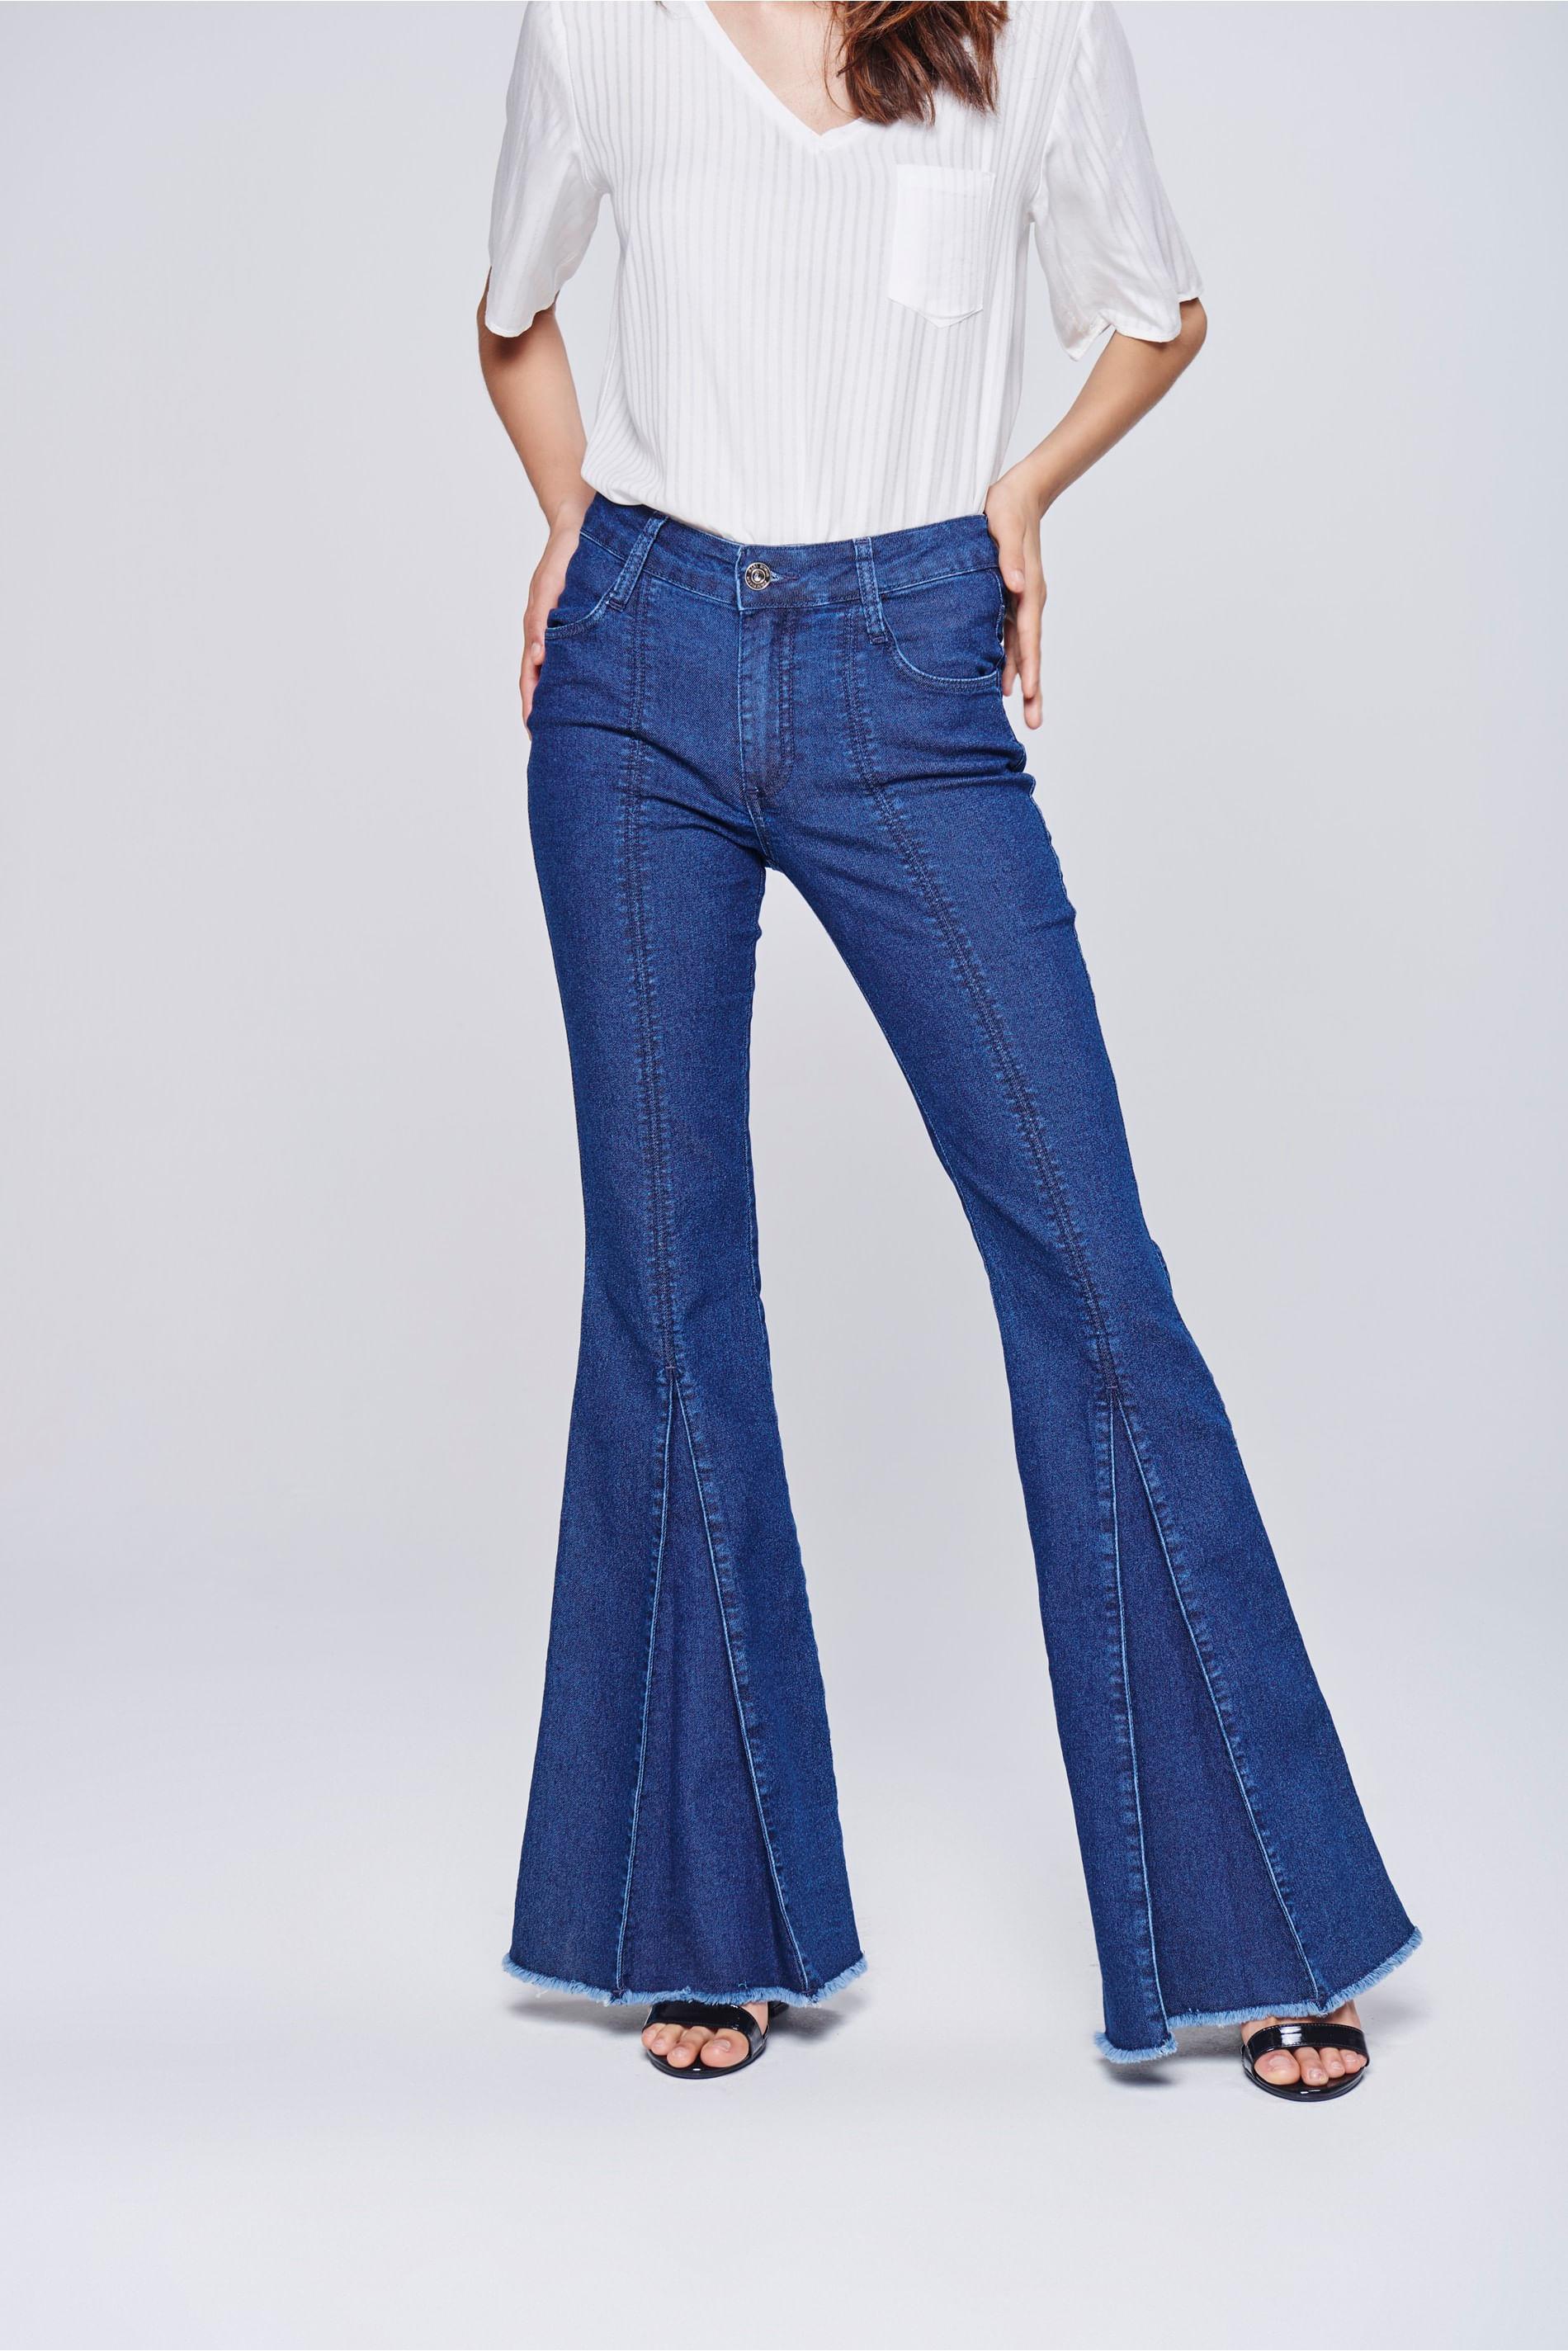 b6431c400 Calça Flare Jeans Feminina Prega Frontal - Damyller